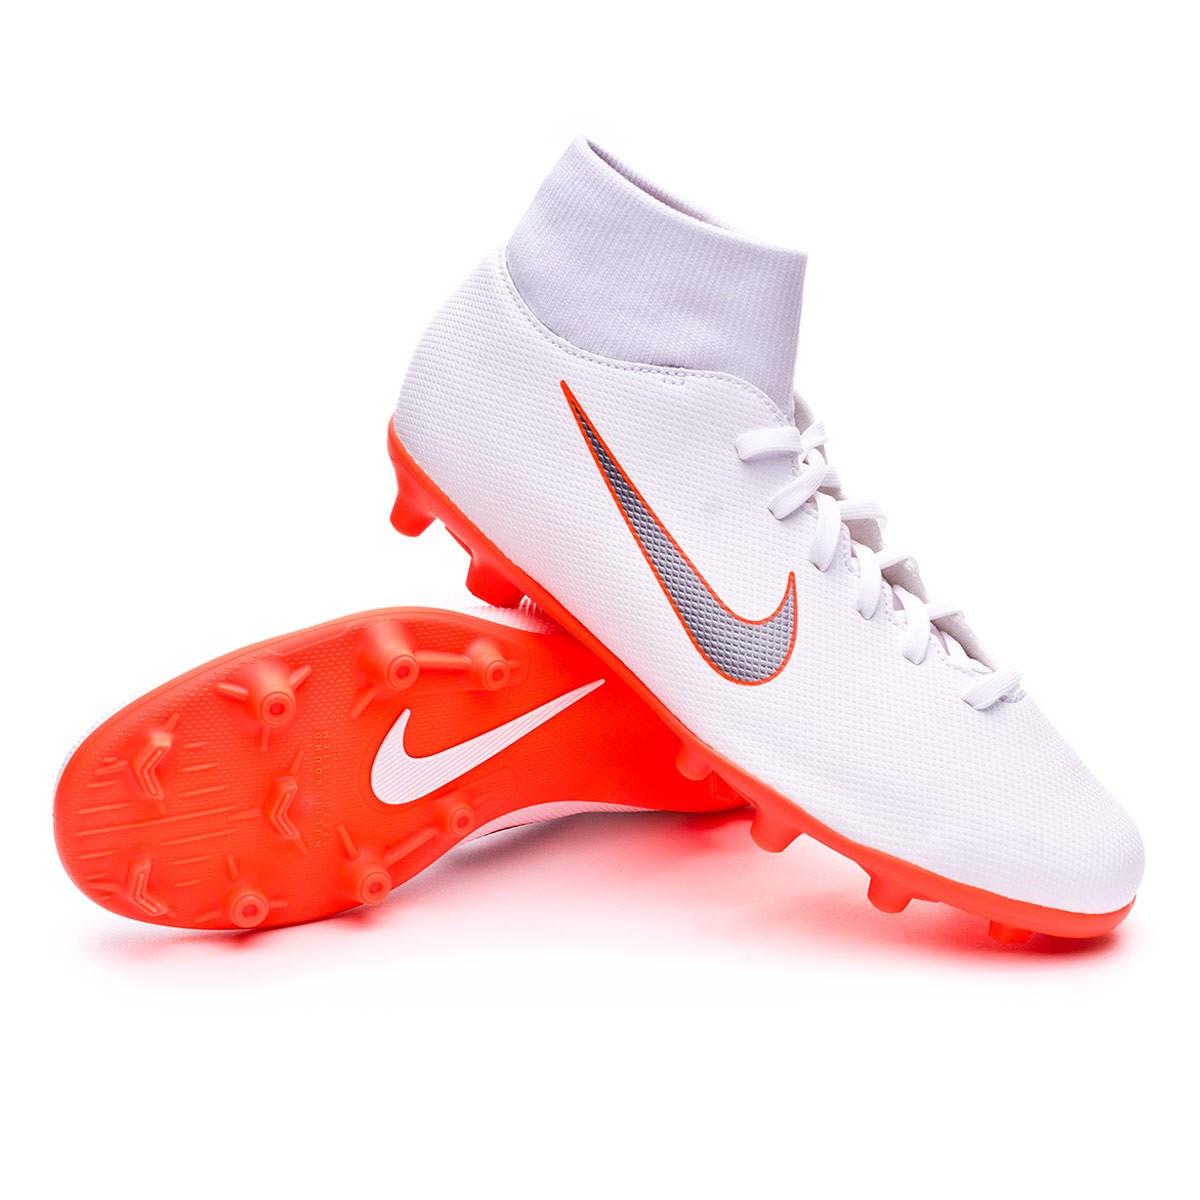 40ffc491e858 Football Boots Nike Mercurial Superfly VI Club MG White-Metallic ...